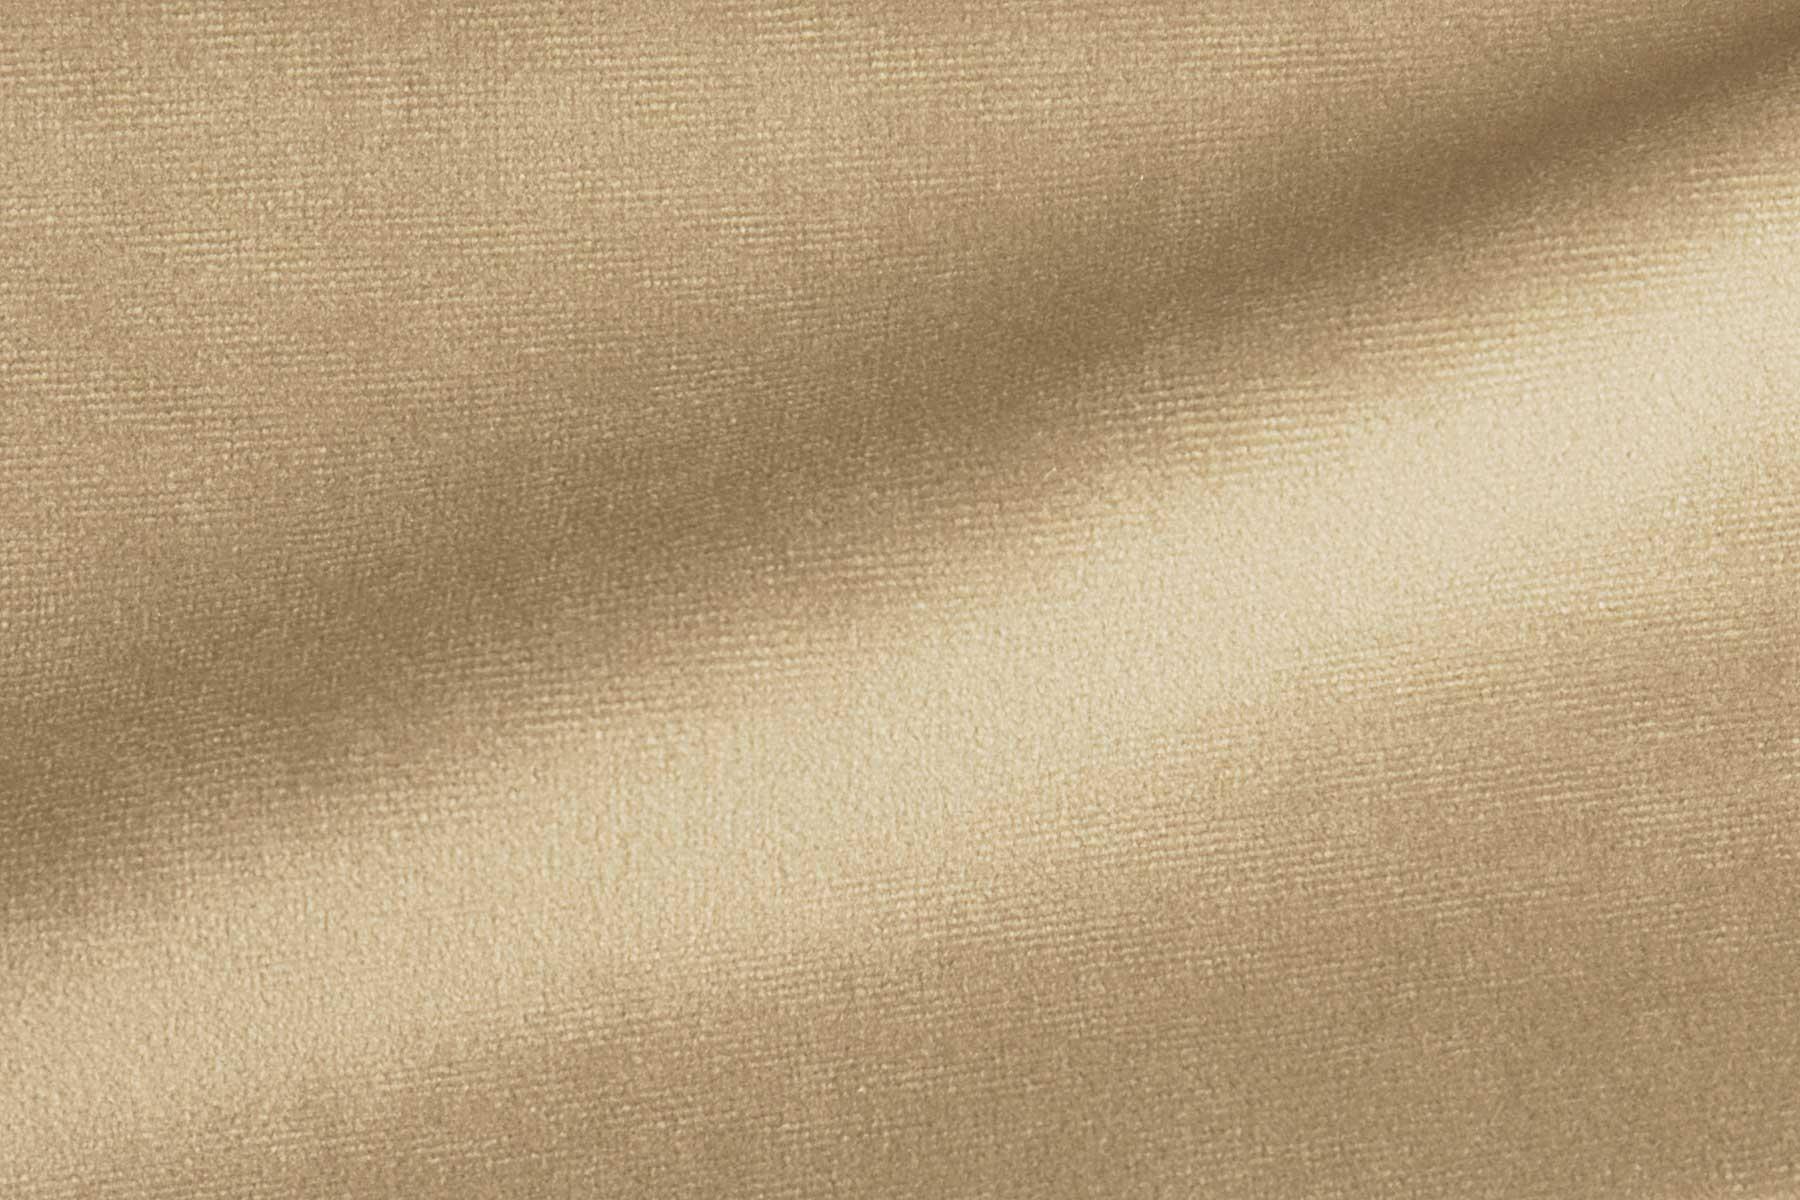 Paris Velvet Champagne Fabric 1 Zoom Big Jpg